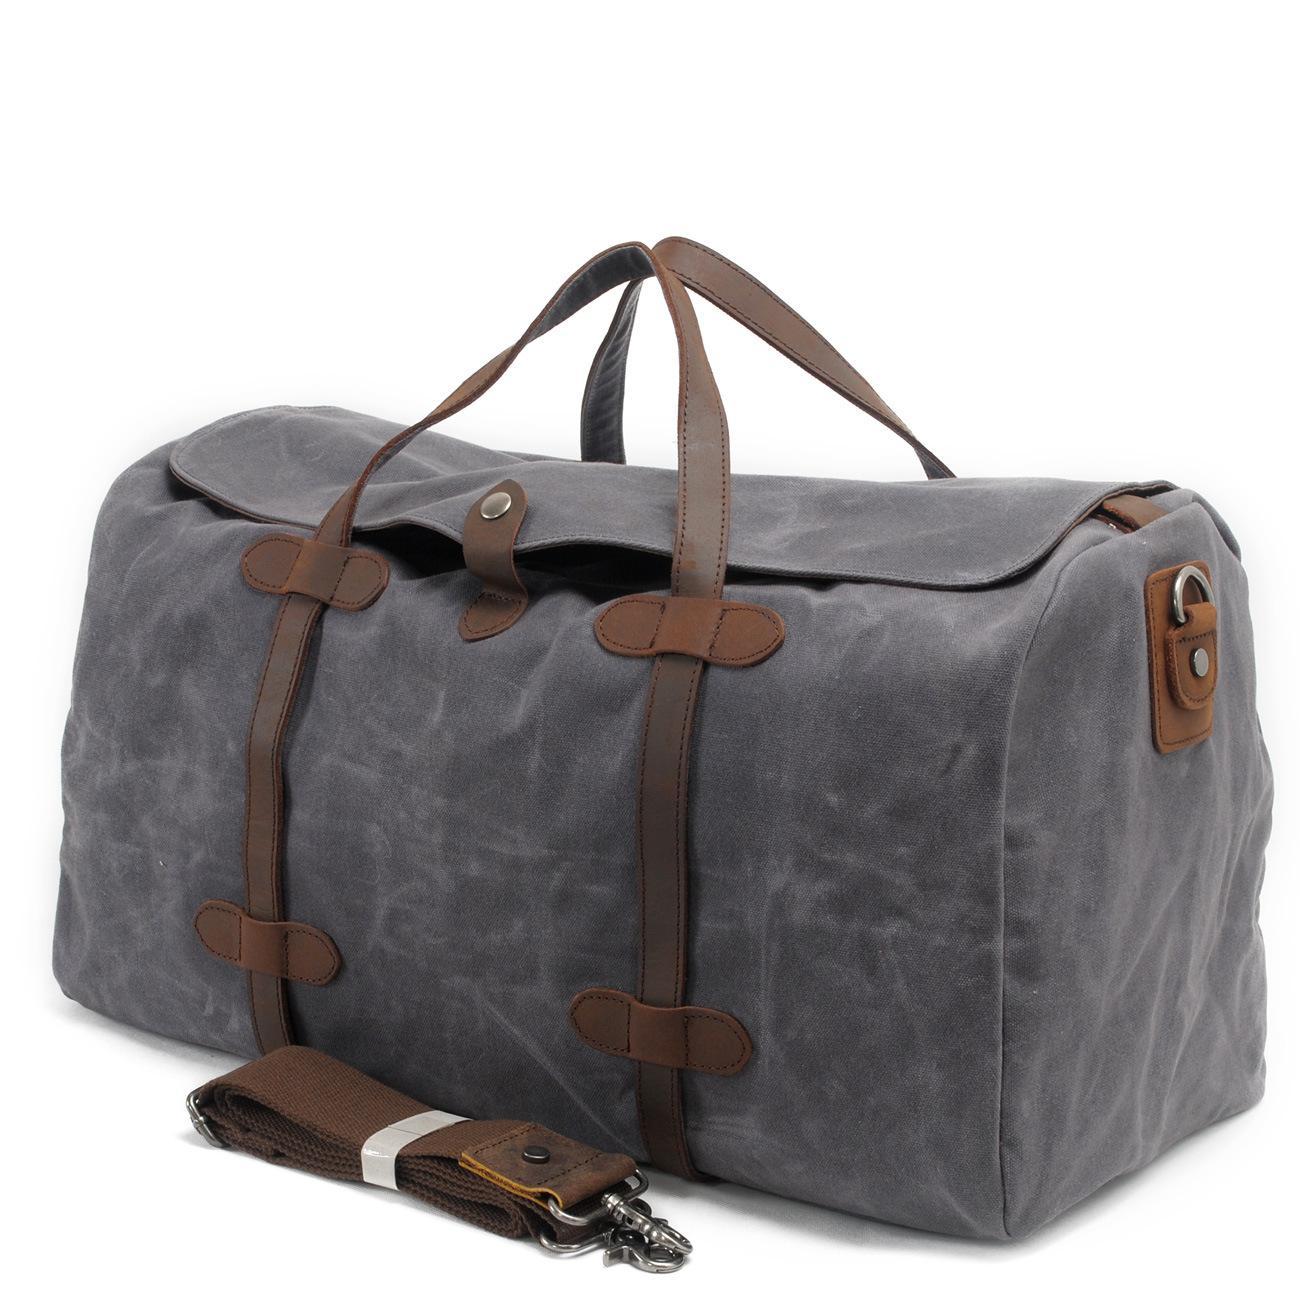 Online Get Cheap Designer Luggage -Aliexpress.com | Alibaba Group